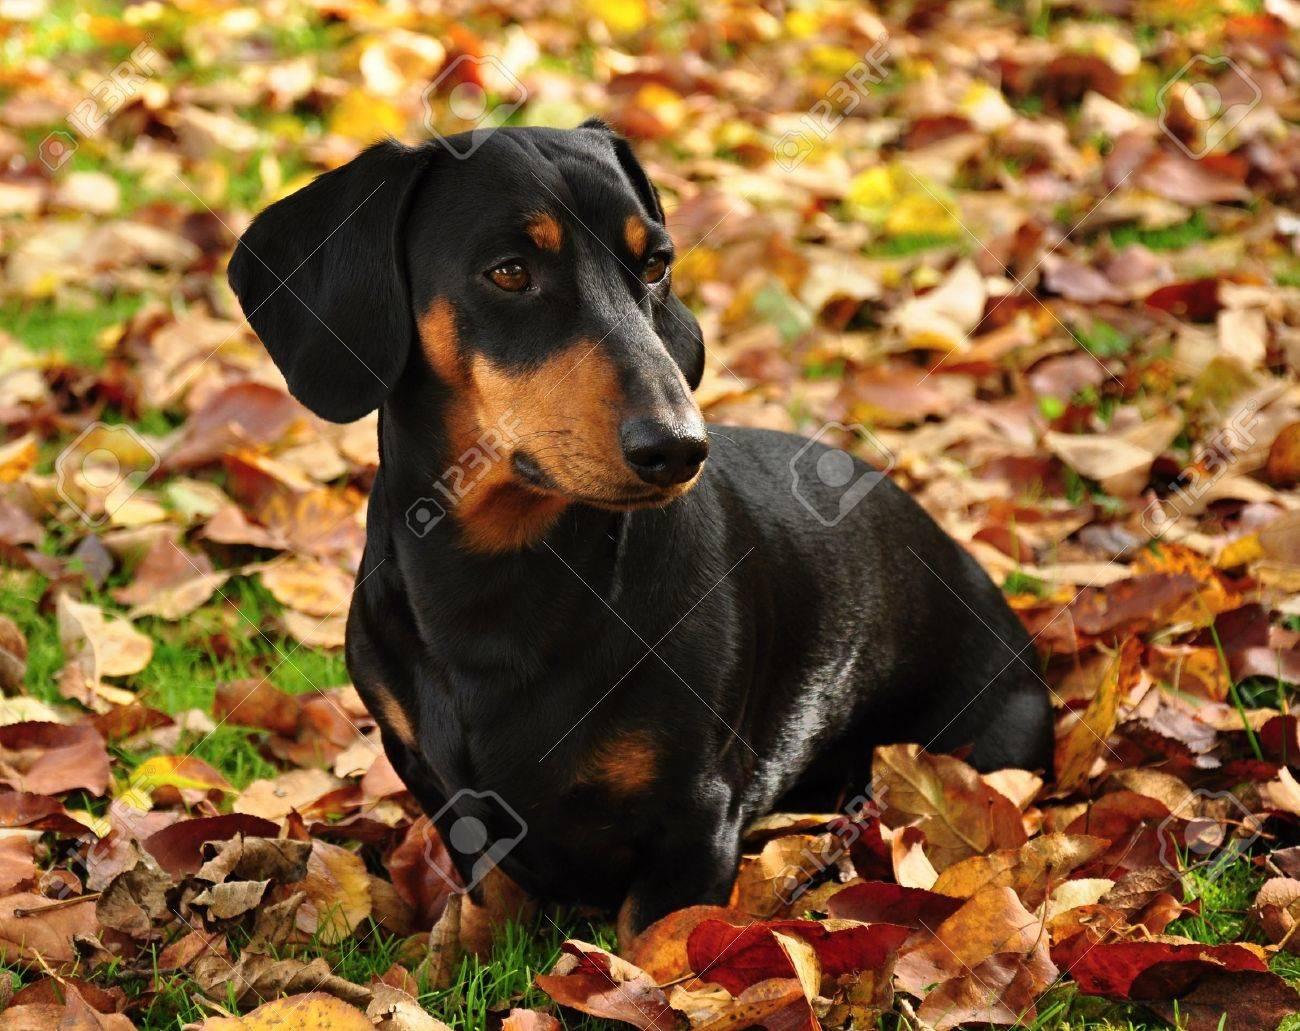 Little black dachshund on autumn garden with leaves Stock Photo - 15820080